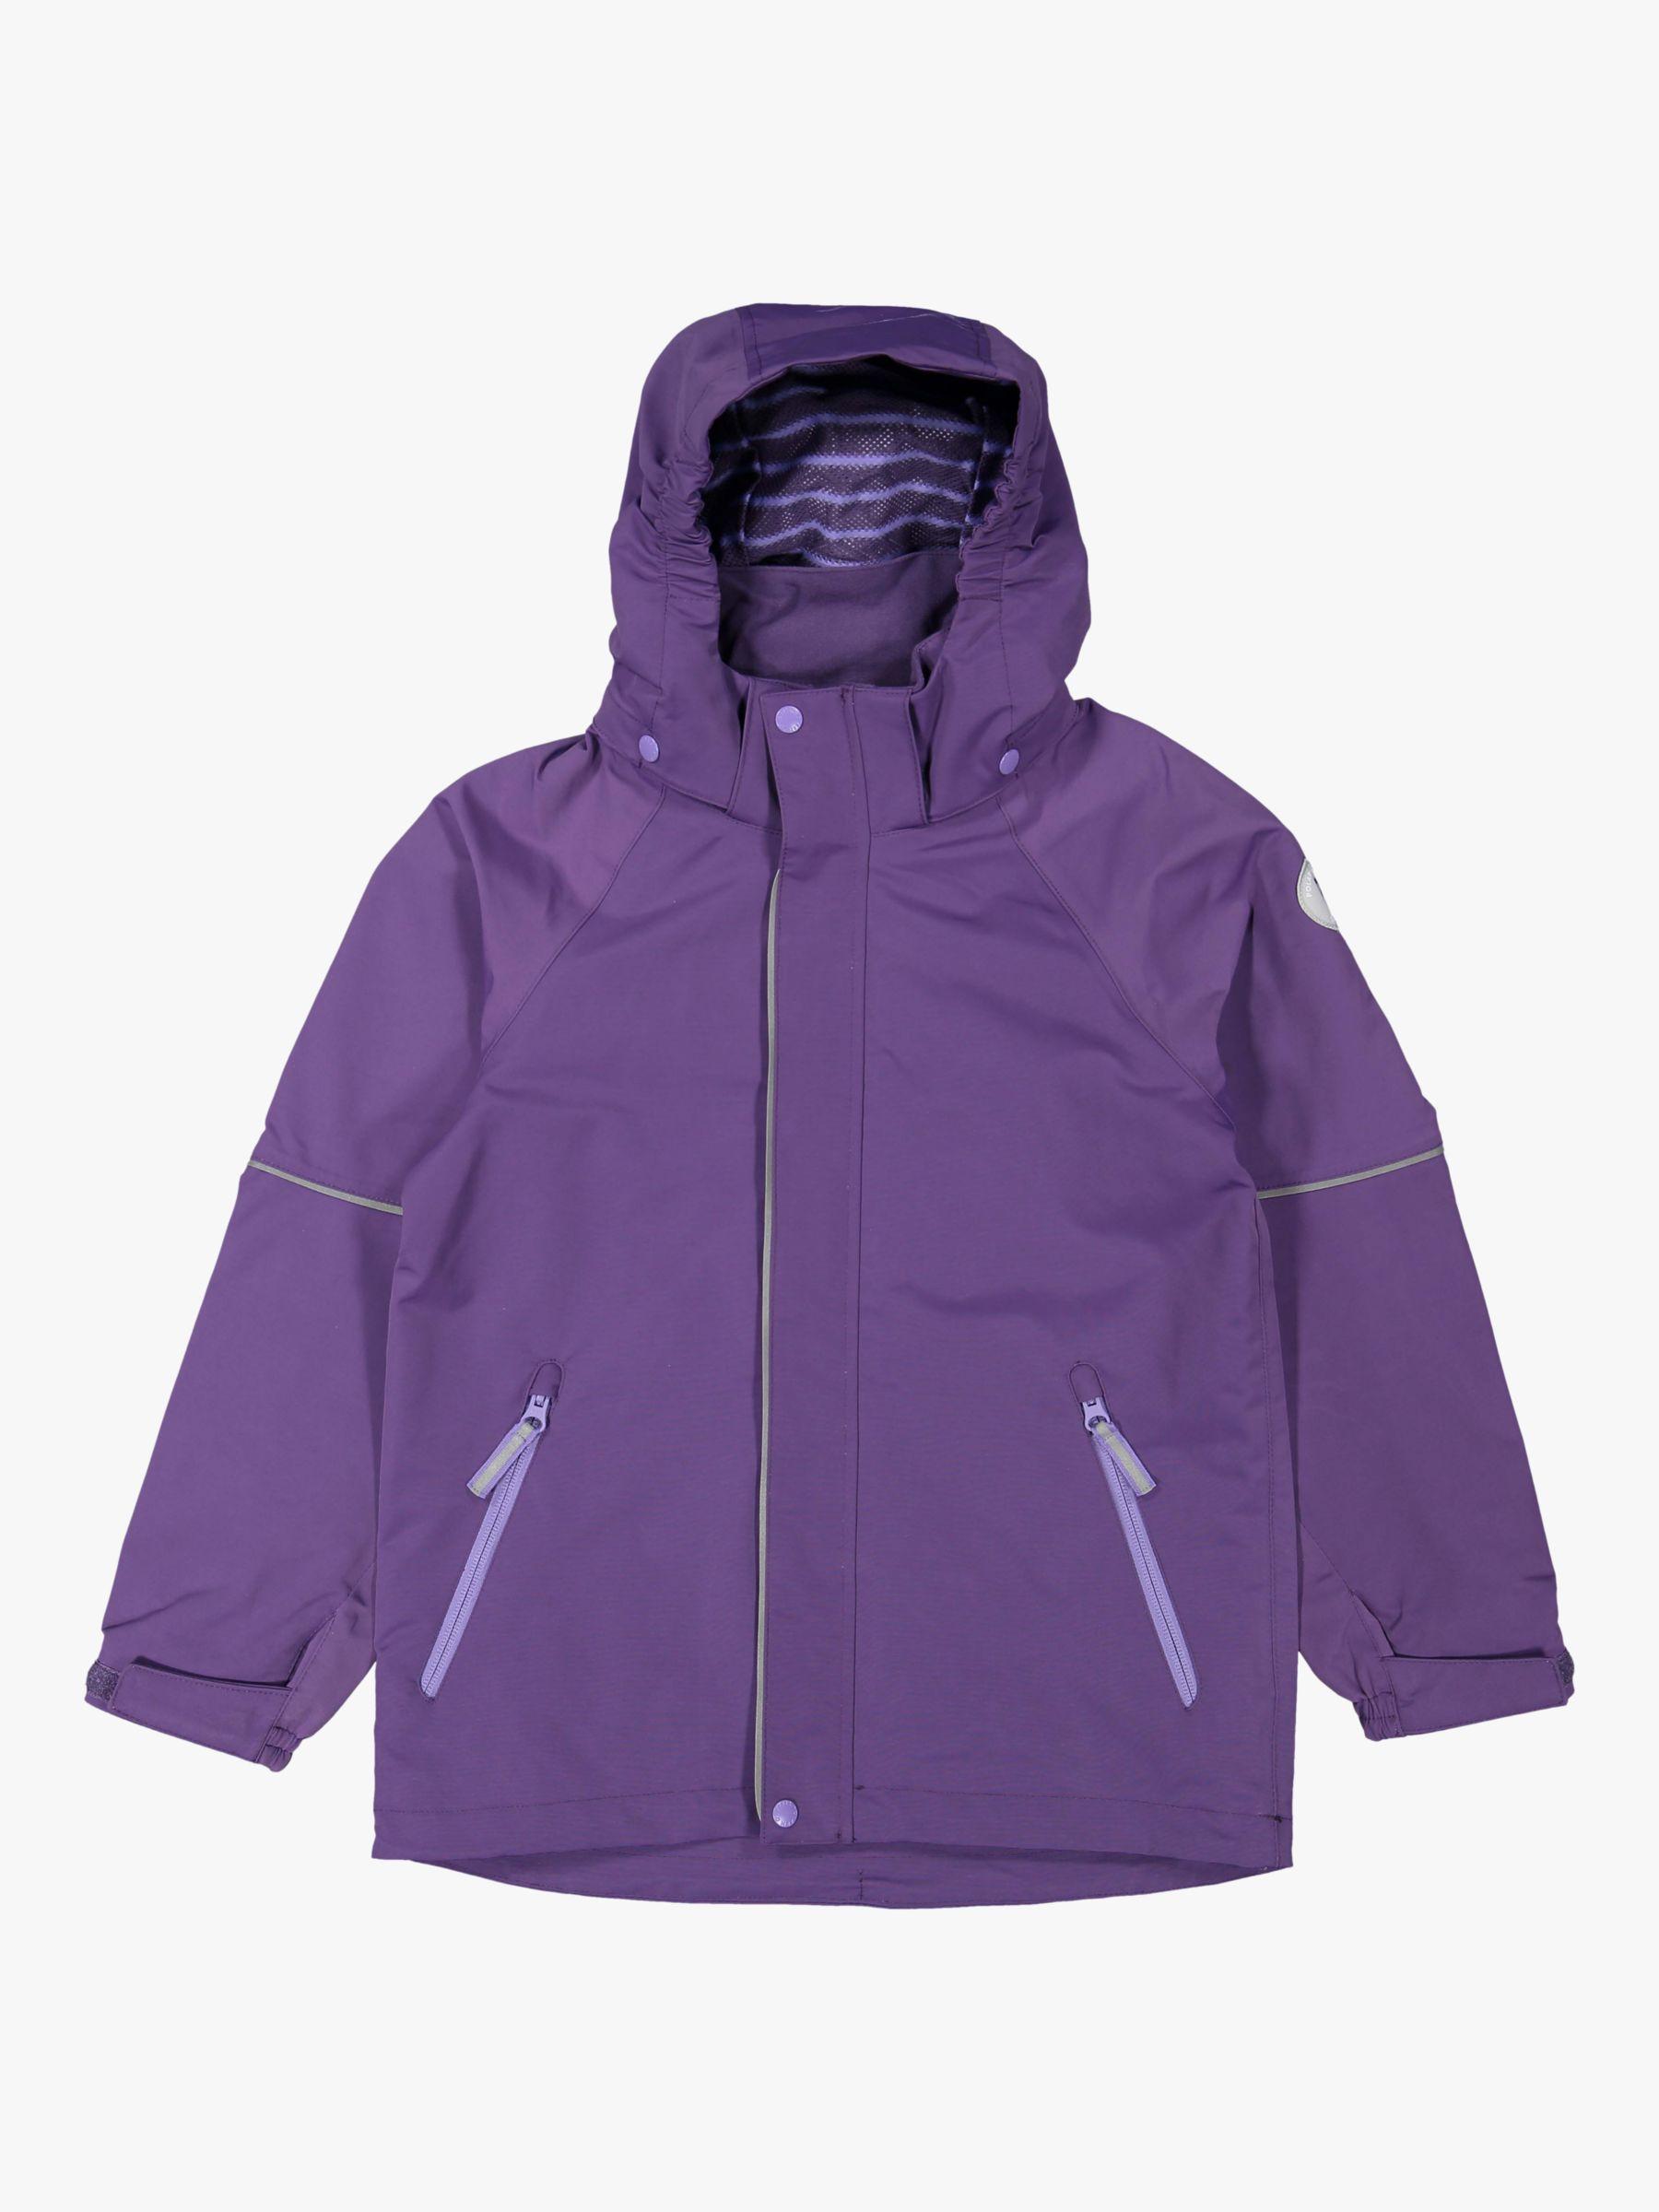 Polarn O. Pyret Polarn O. Pyret Children's Shell Coat, Purple